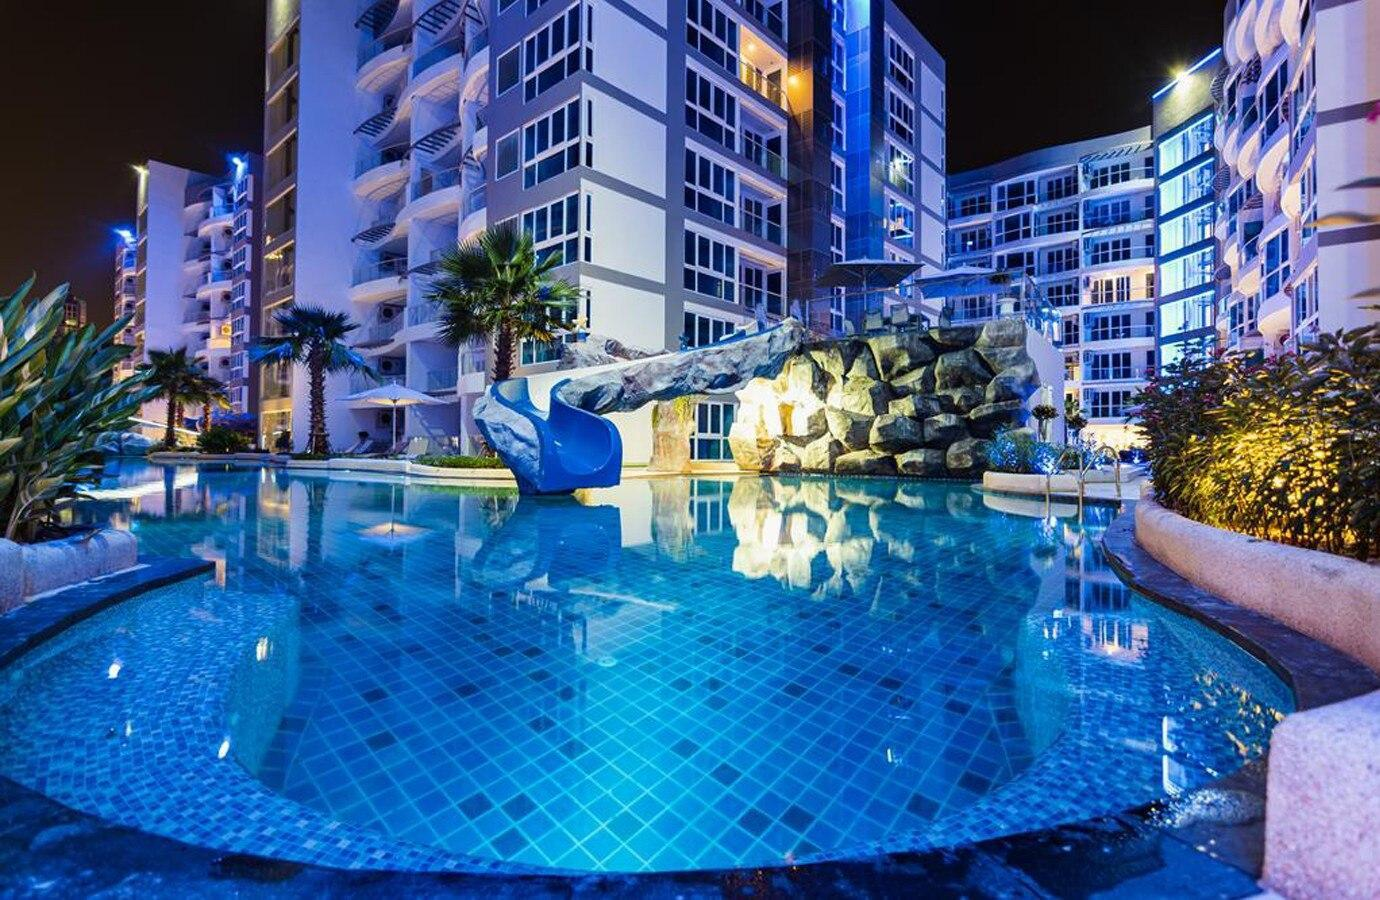 New room in Pattaya Grand Avenue apartment & pool อพาร์ตเมนต์ 1 ห้องนอน 1 ห้องน้ำส่วนตัว ขนาด 47 ตร.ม. – พัทยากลาง